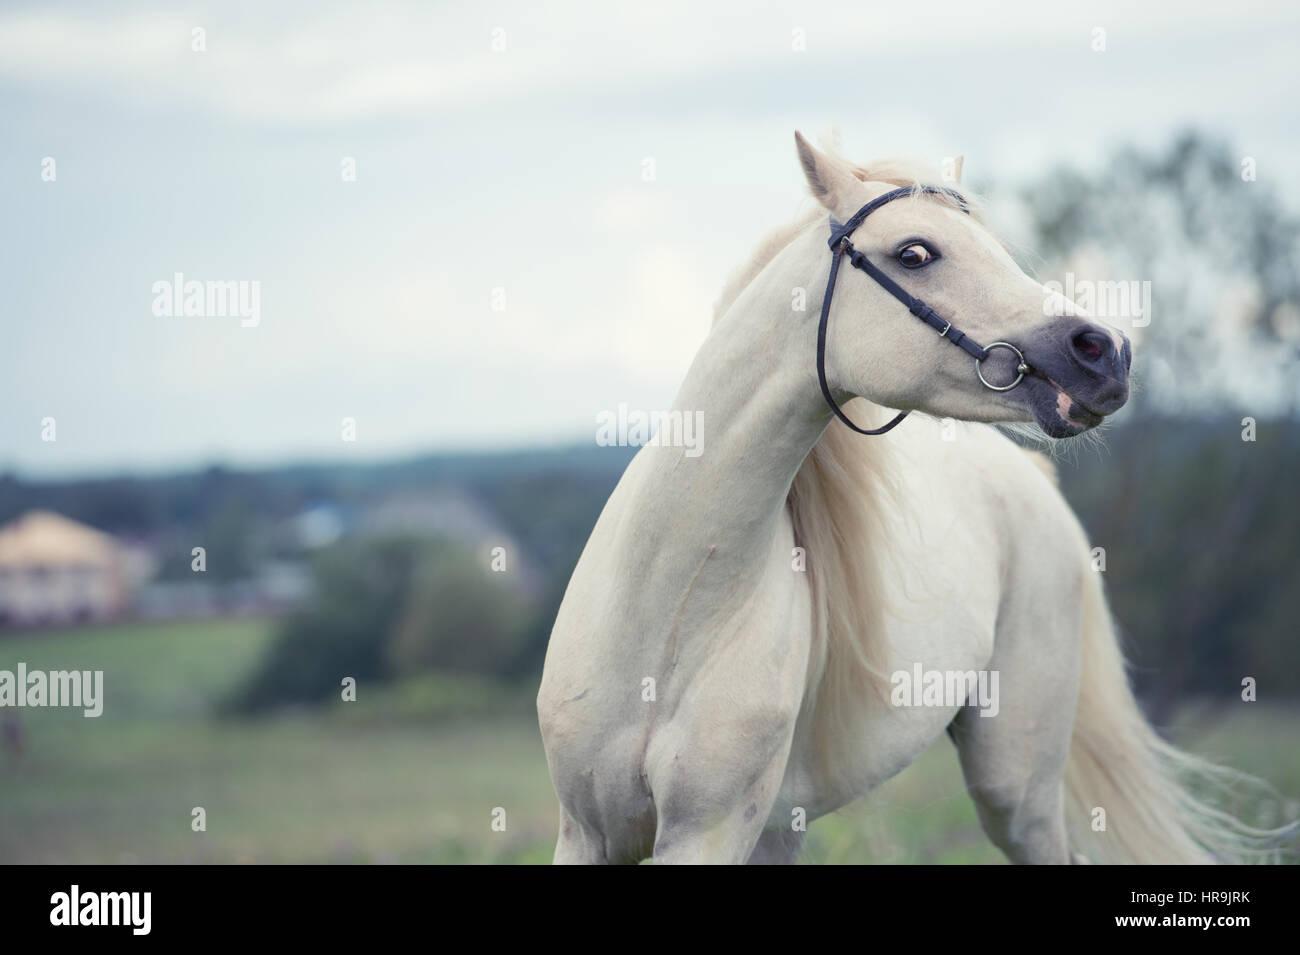 beautiful cream pony stallion running in field. cloudy day - Stock Image